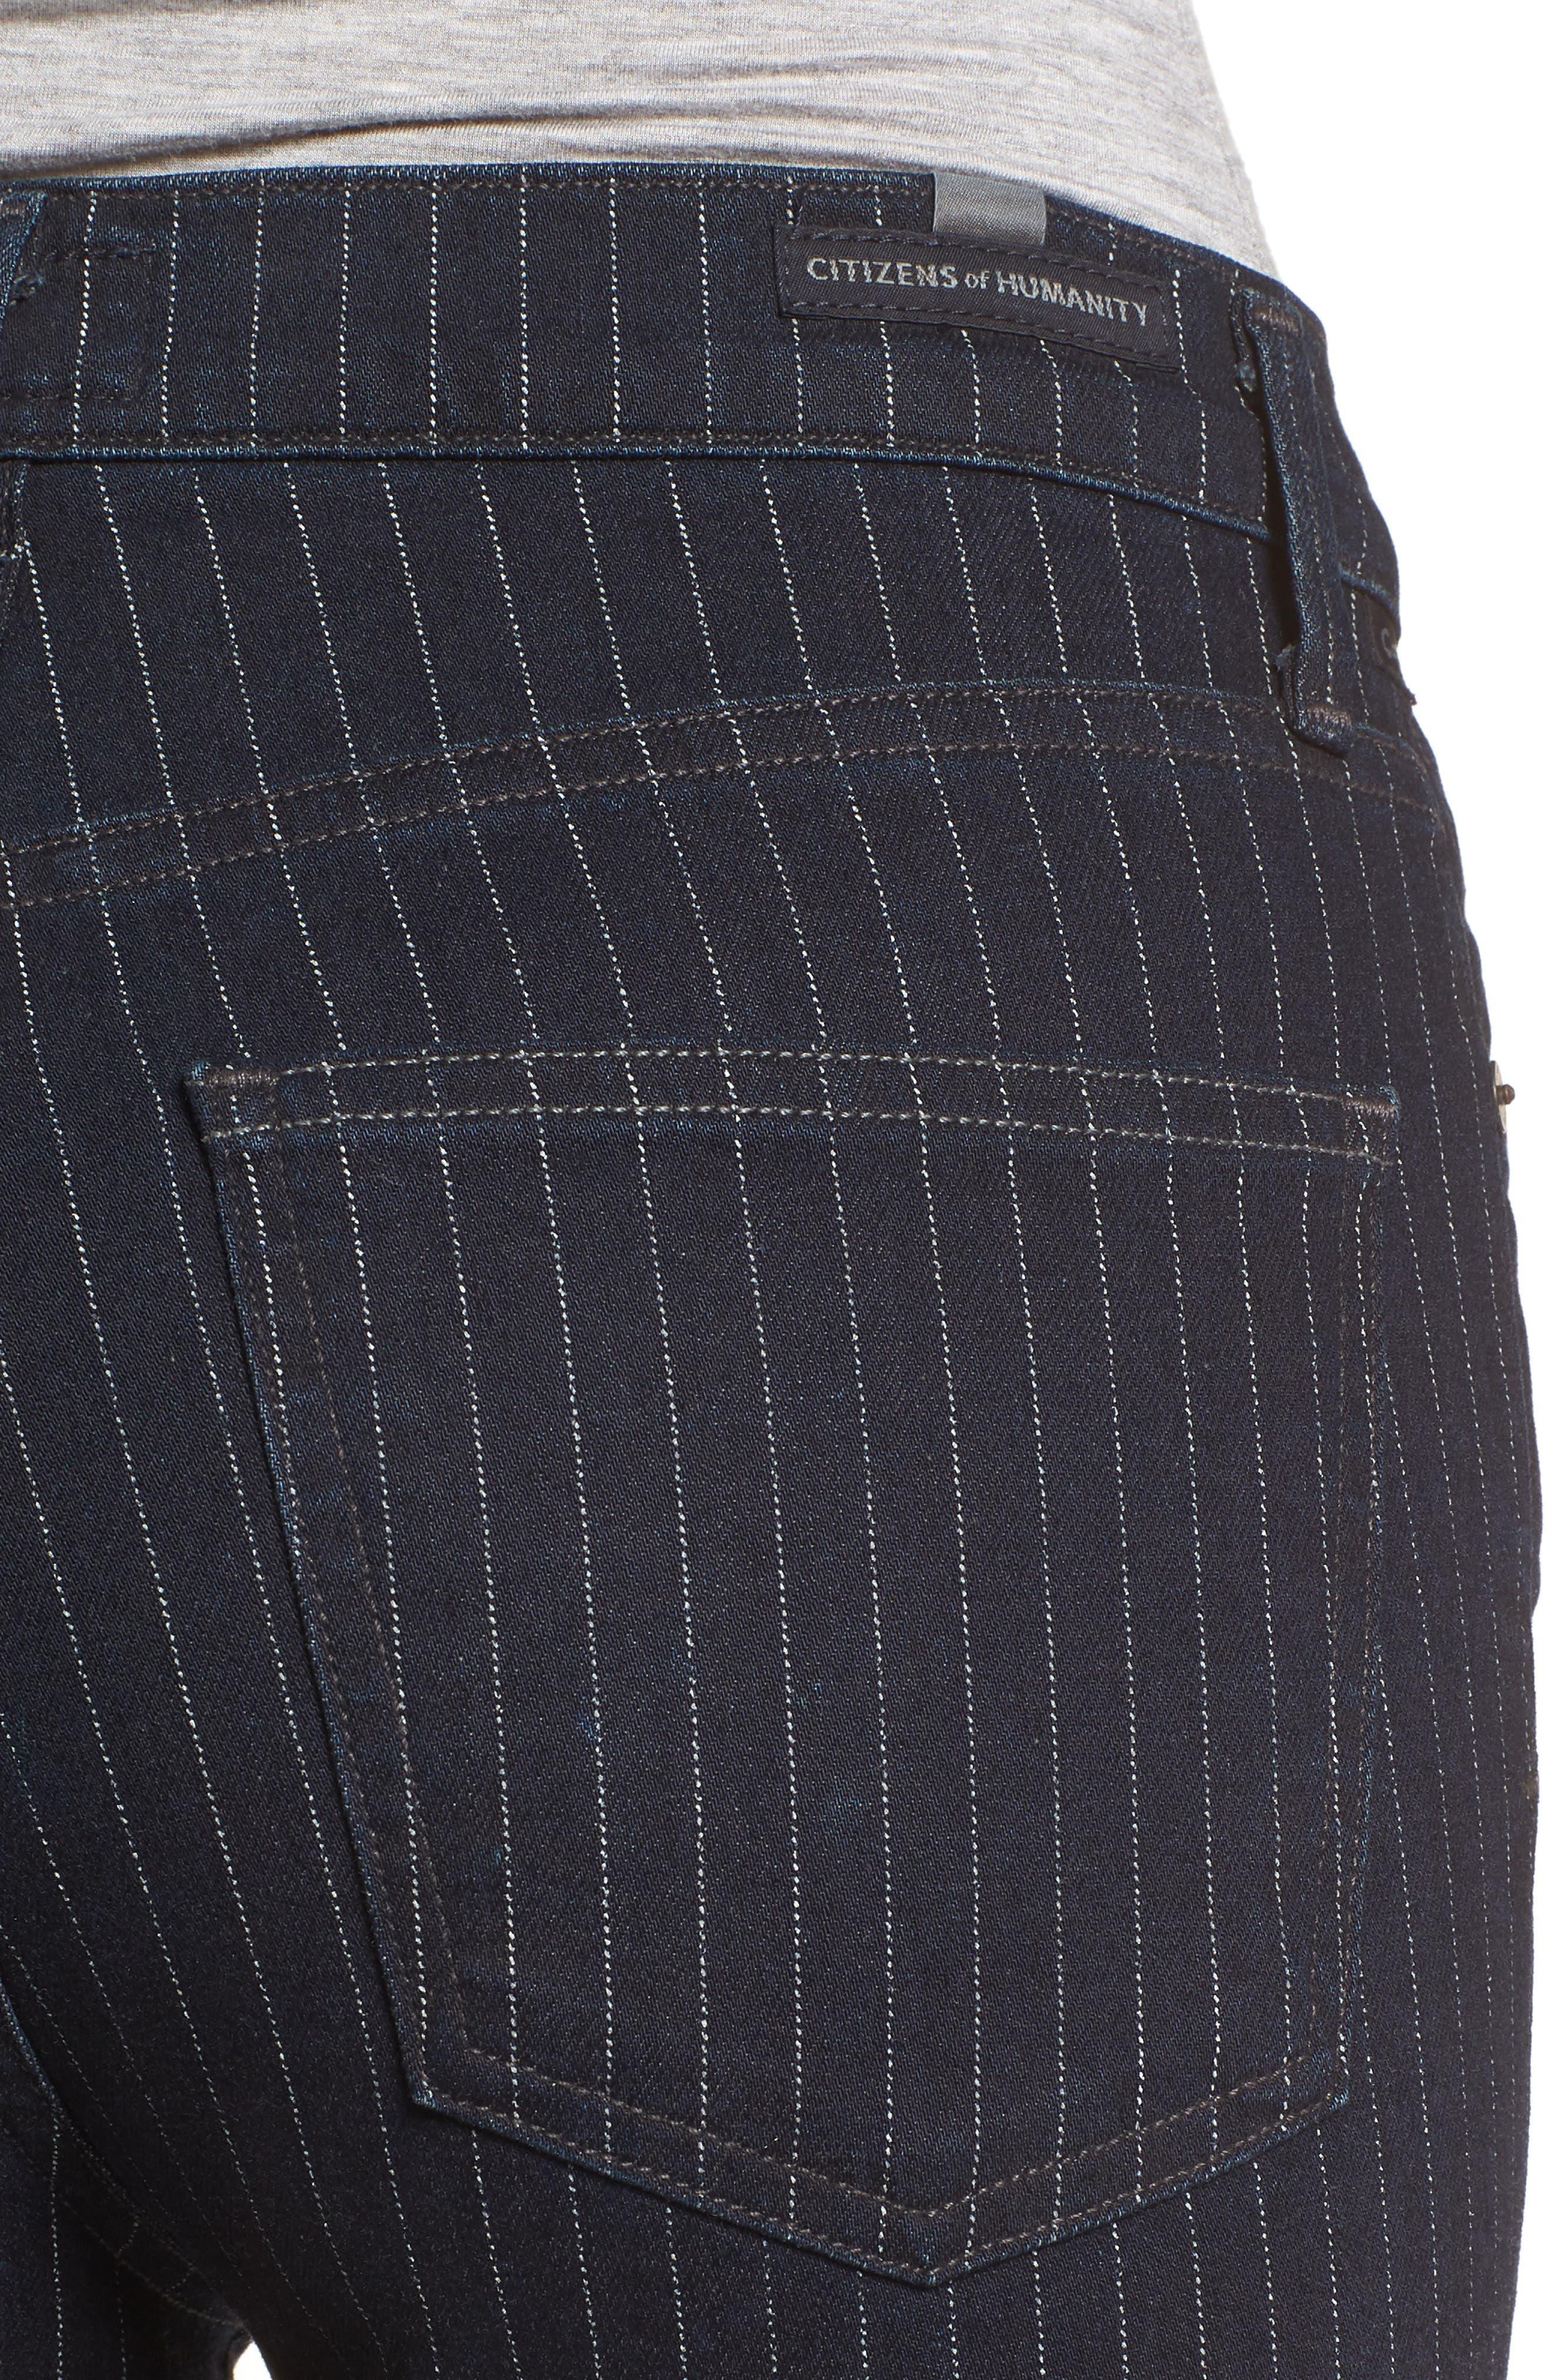 Rocket High Waist Crop Skinny Jeans,                             Alternate thumbnail 4, color,